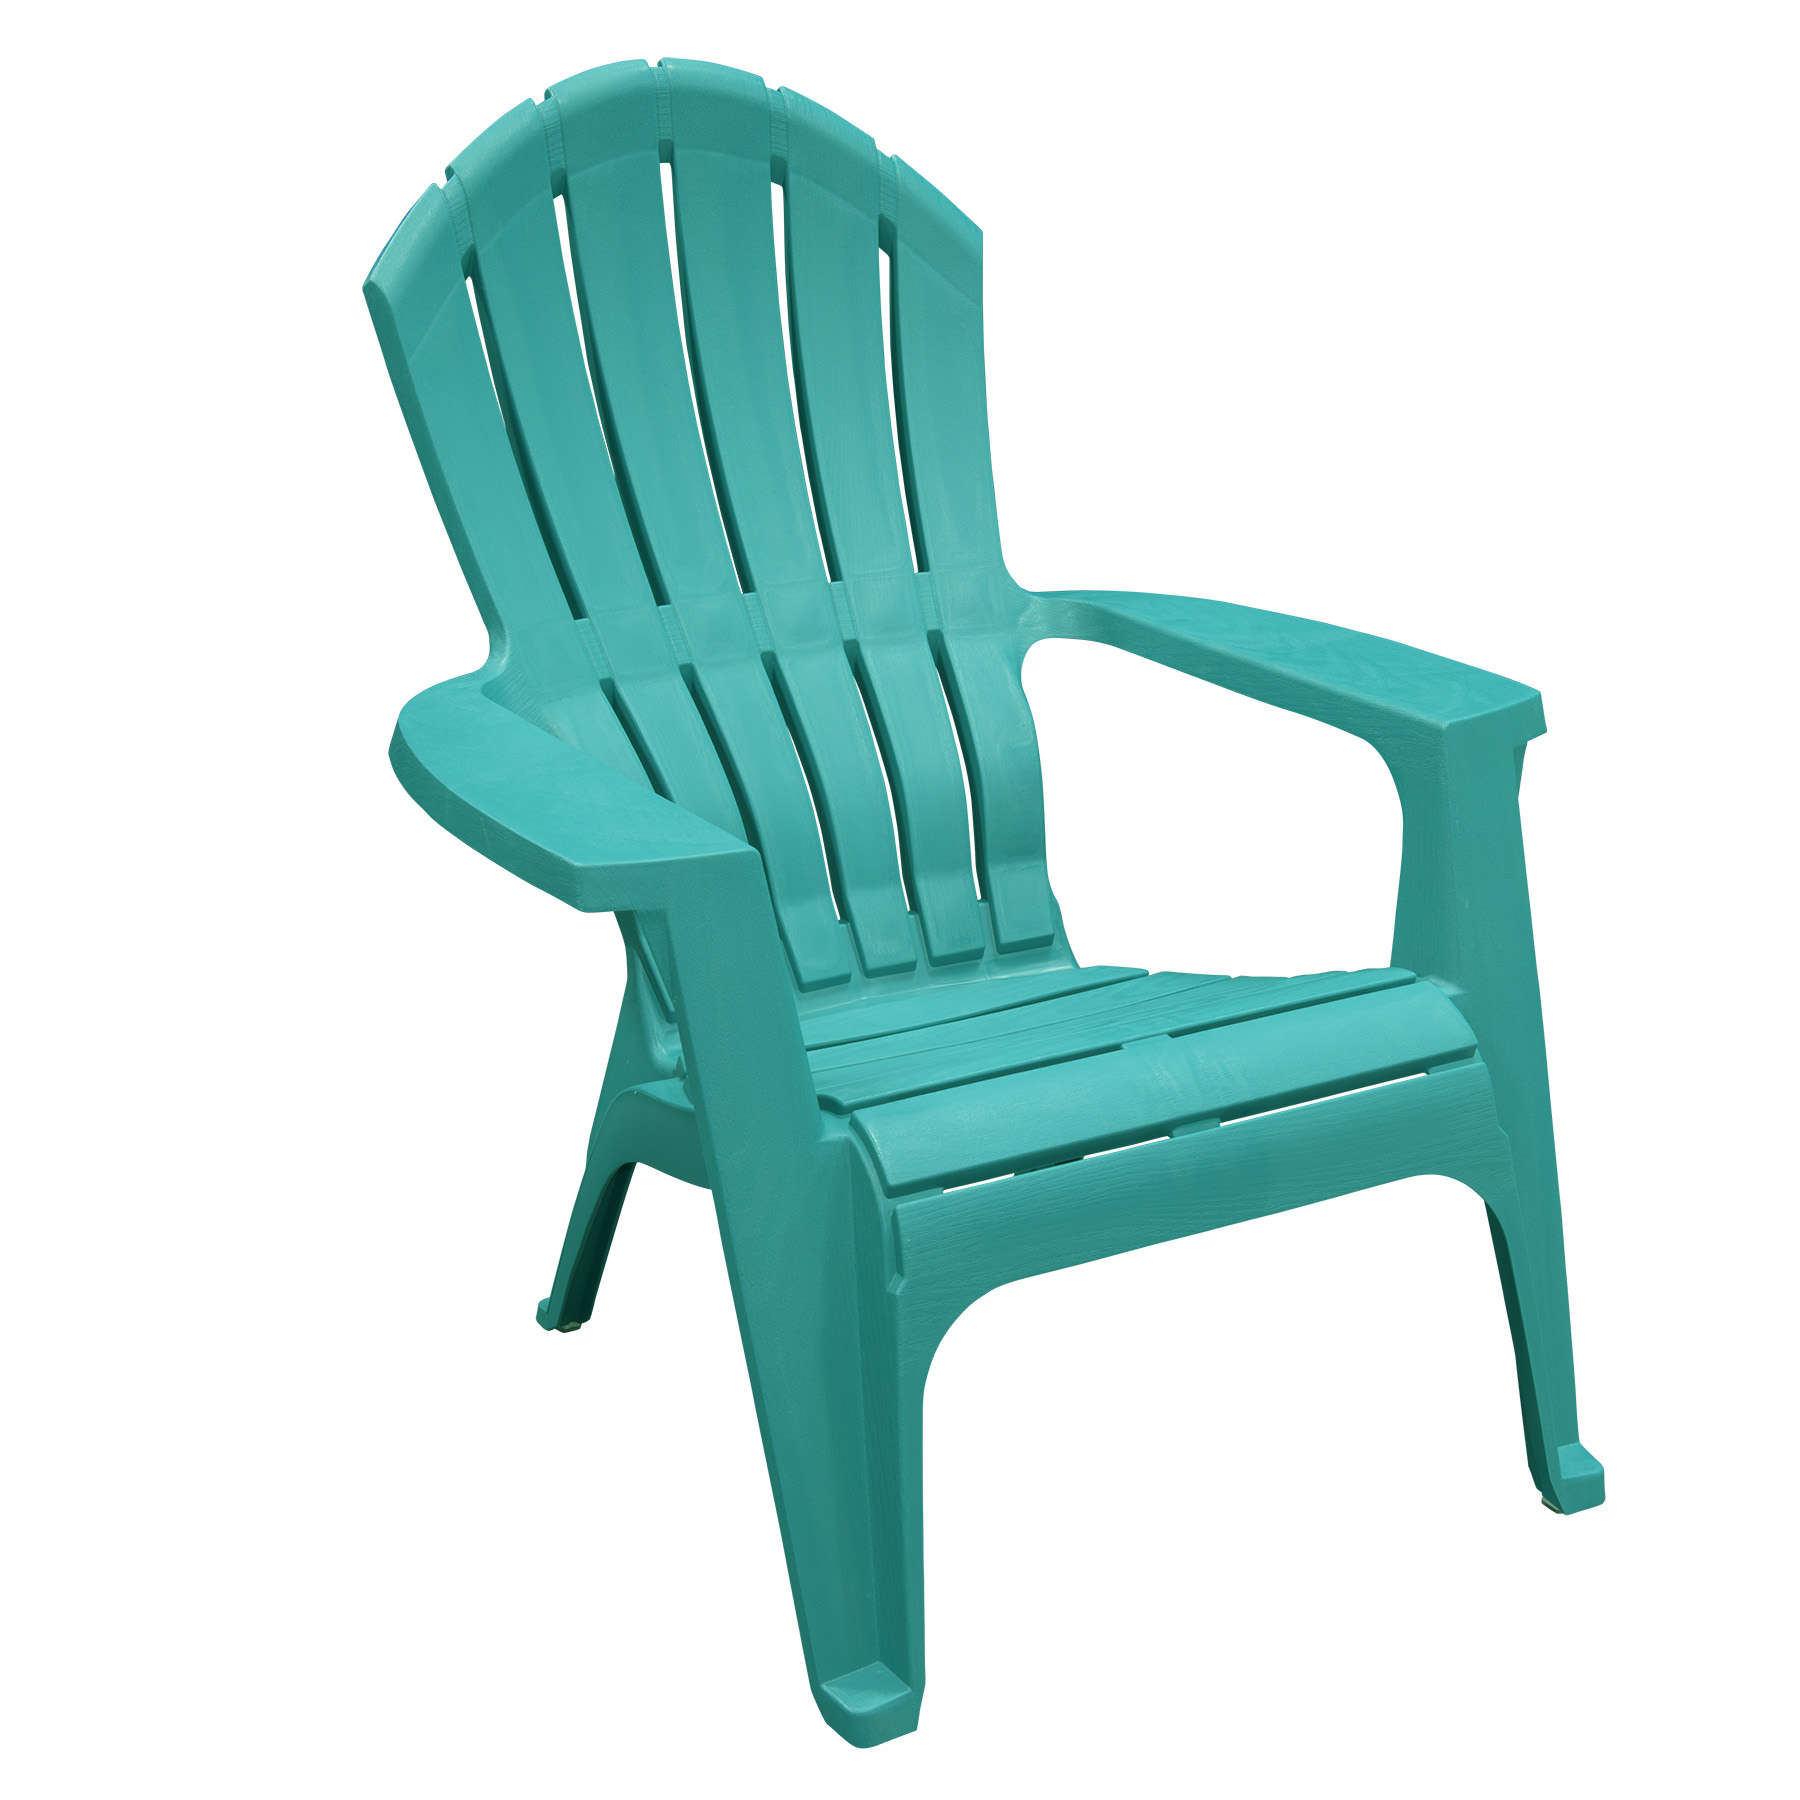 Adams Manufacturing RealComfort Adirondack Chair - Teal